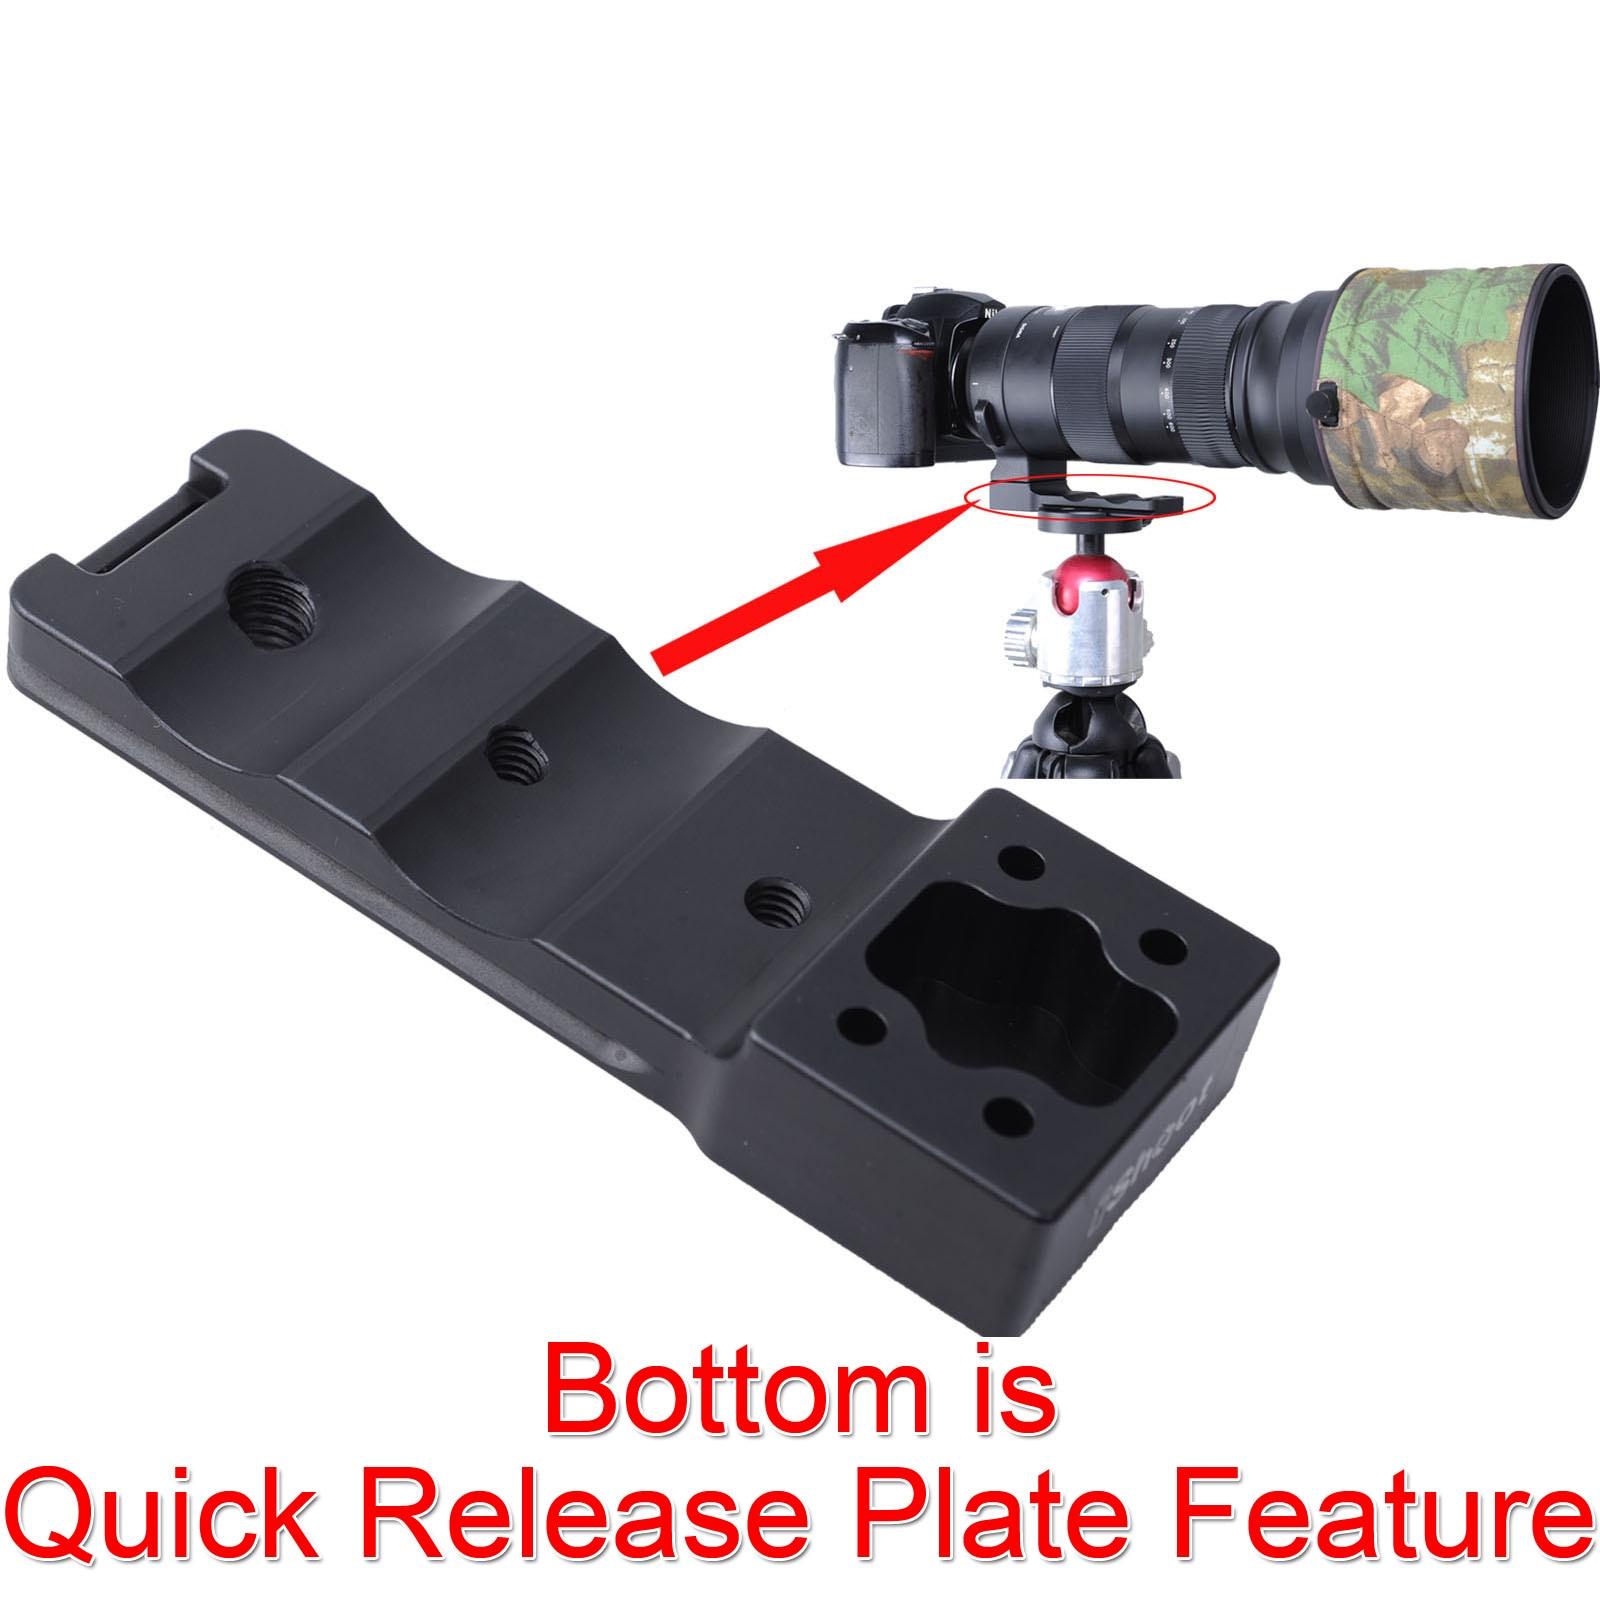 Lens Support Collar Foot Tripod Mount Ring Quick Release Plate Stand Base Replacement fr Sigma 150-600mm F5-6.3 DG OS HSM Sports sigma sigma 150 600mm f5 6 3 dg os hsm contemporary полнокадровой телефото зум объектив для съемки птиц лотоса canon байонет